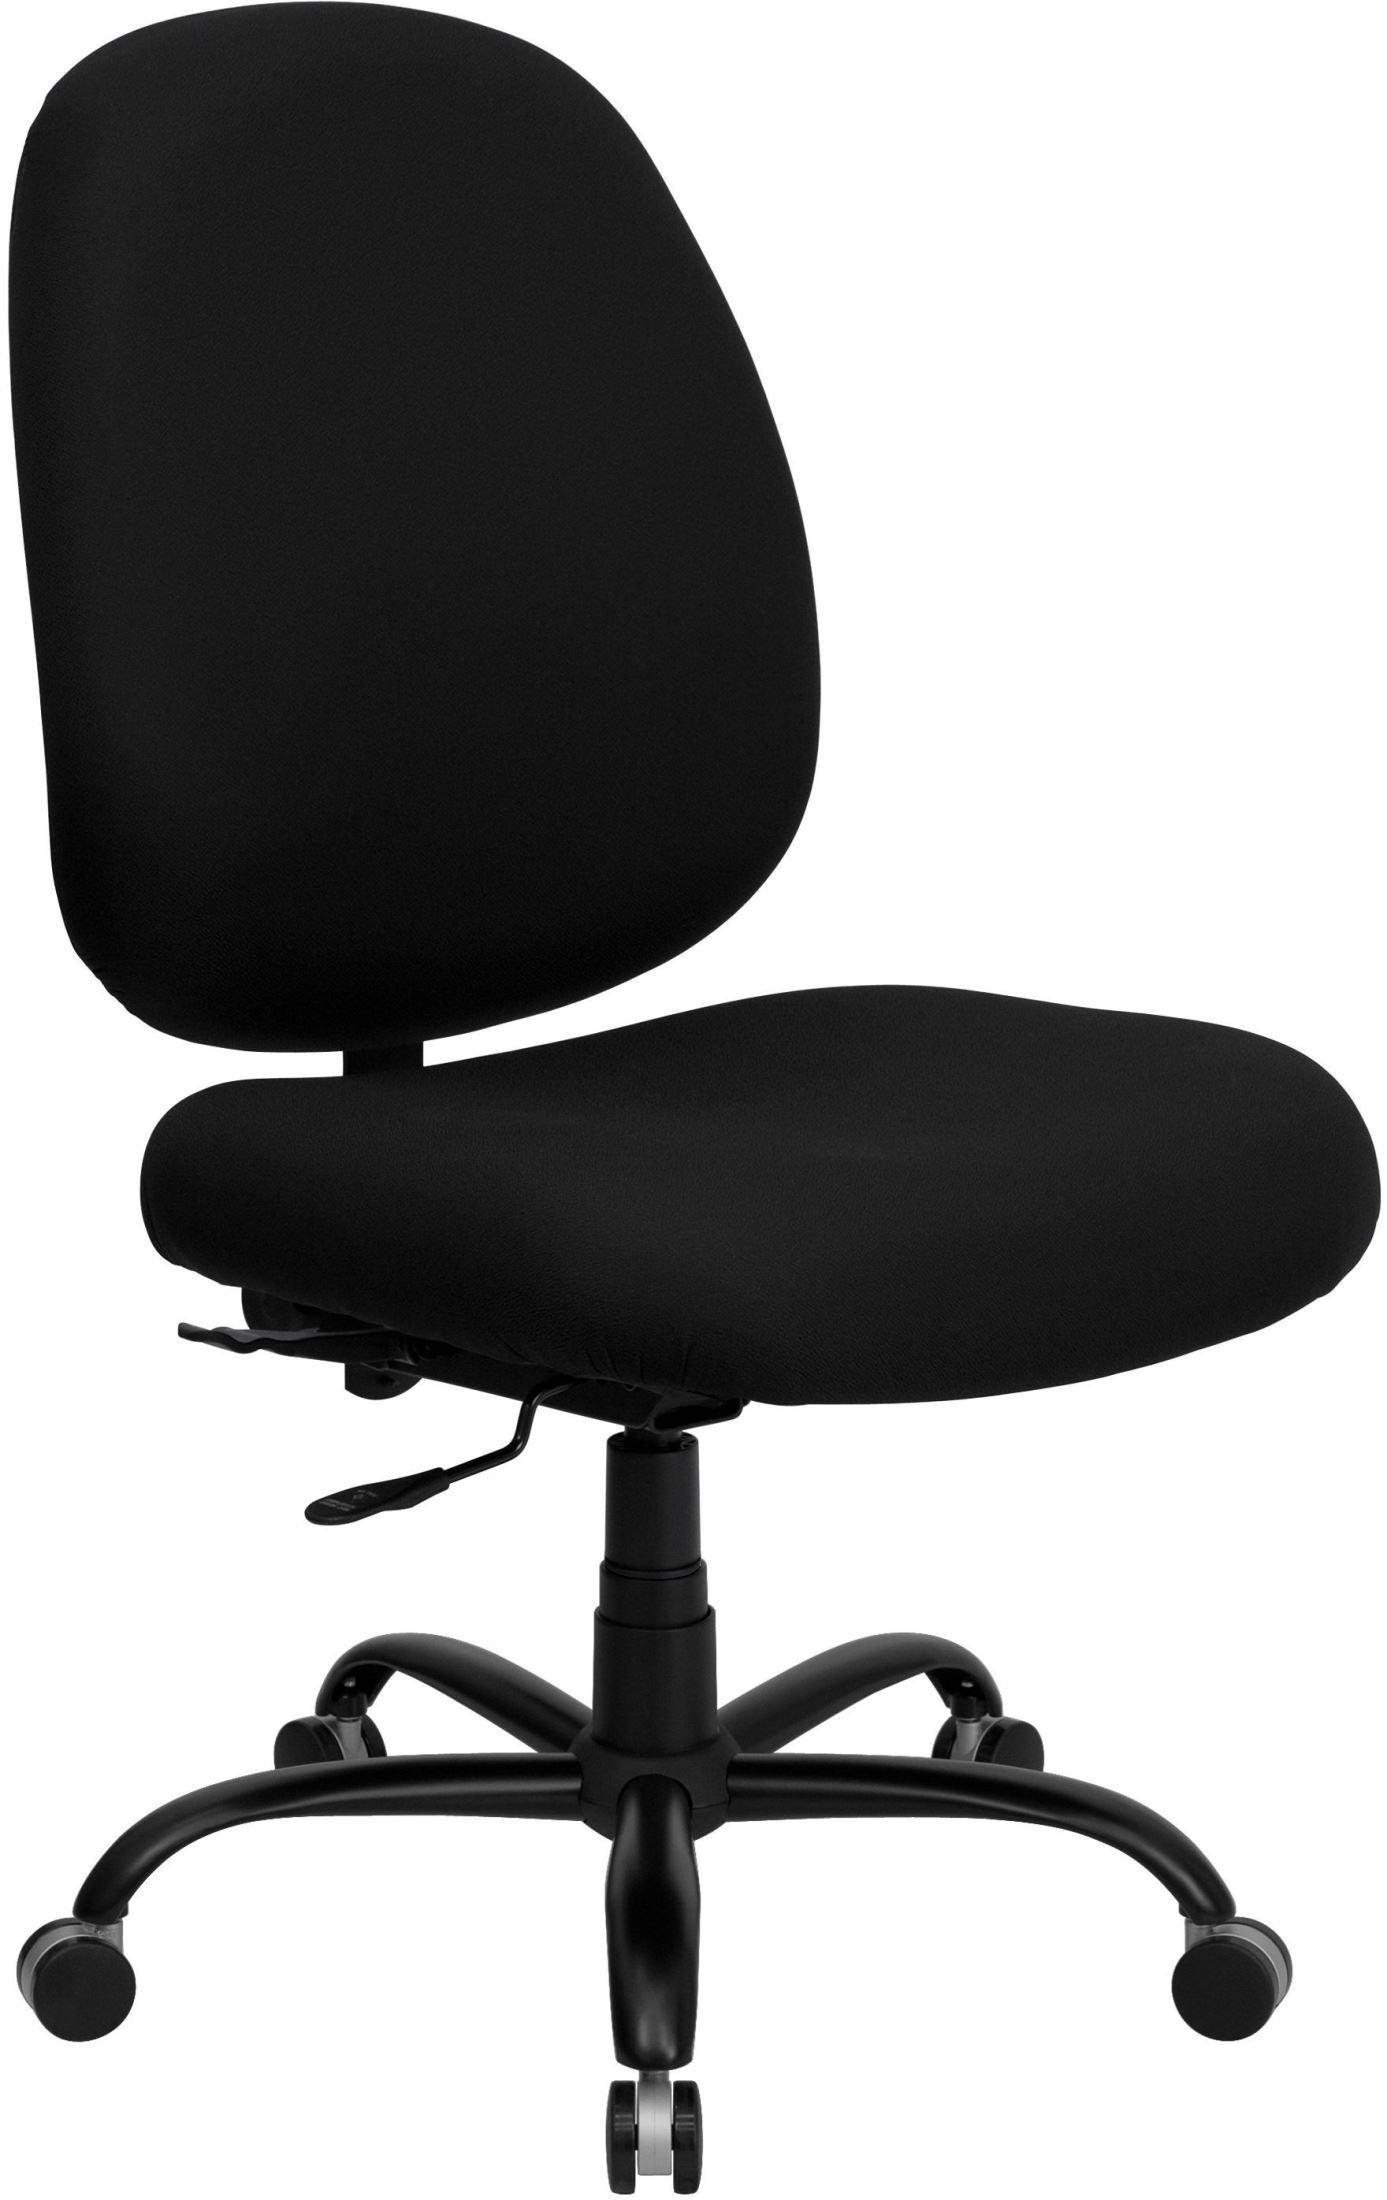 Hercules 500 Lb Capacity Big And Tall Black fice Chair